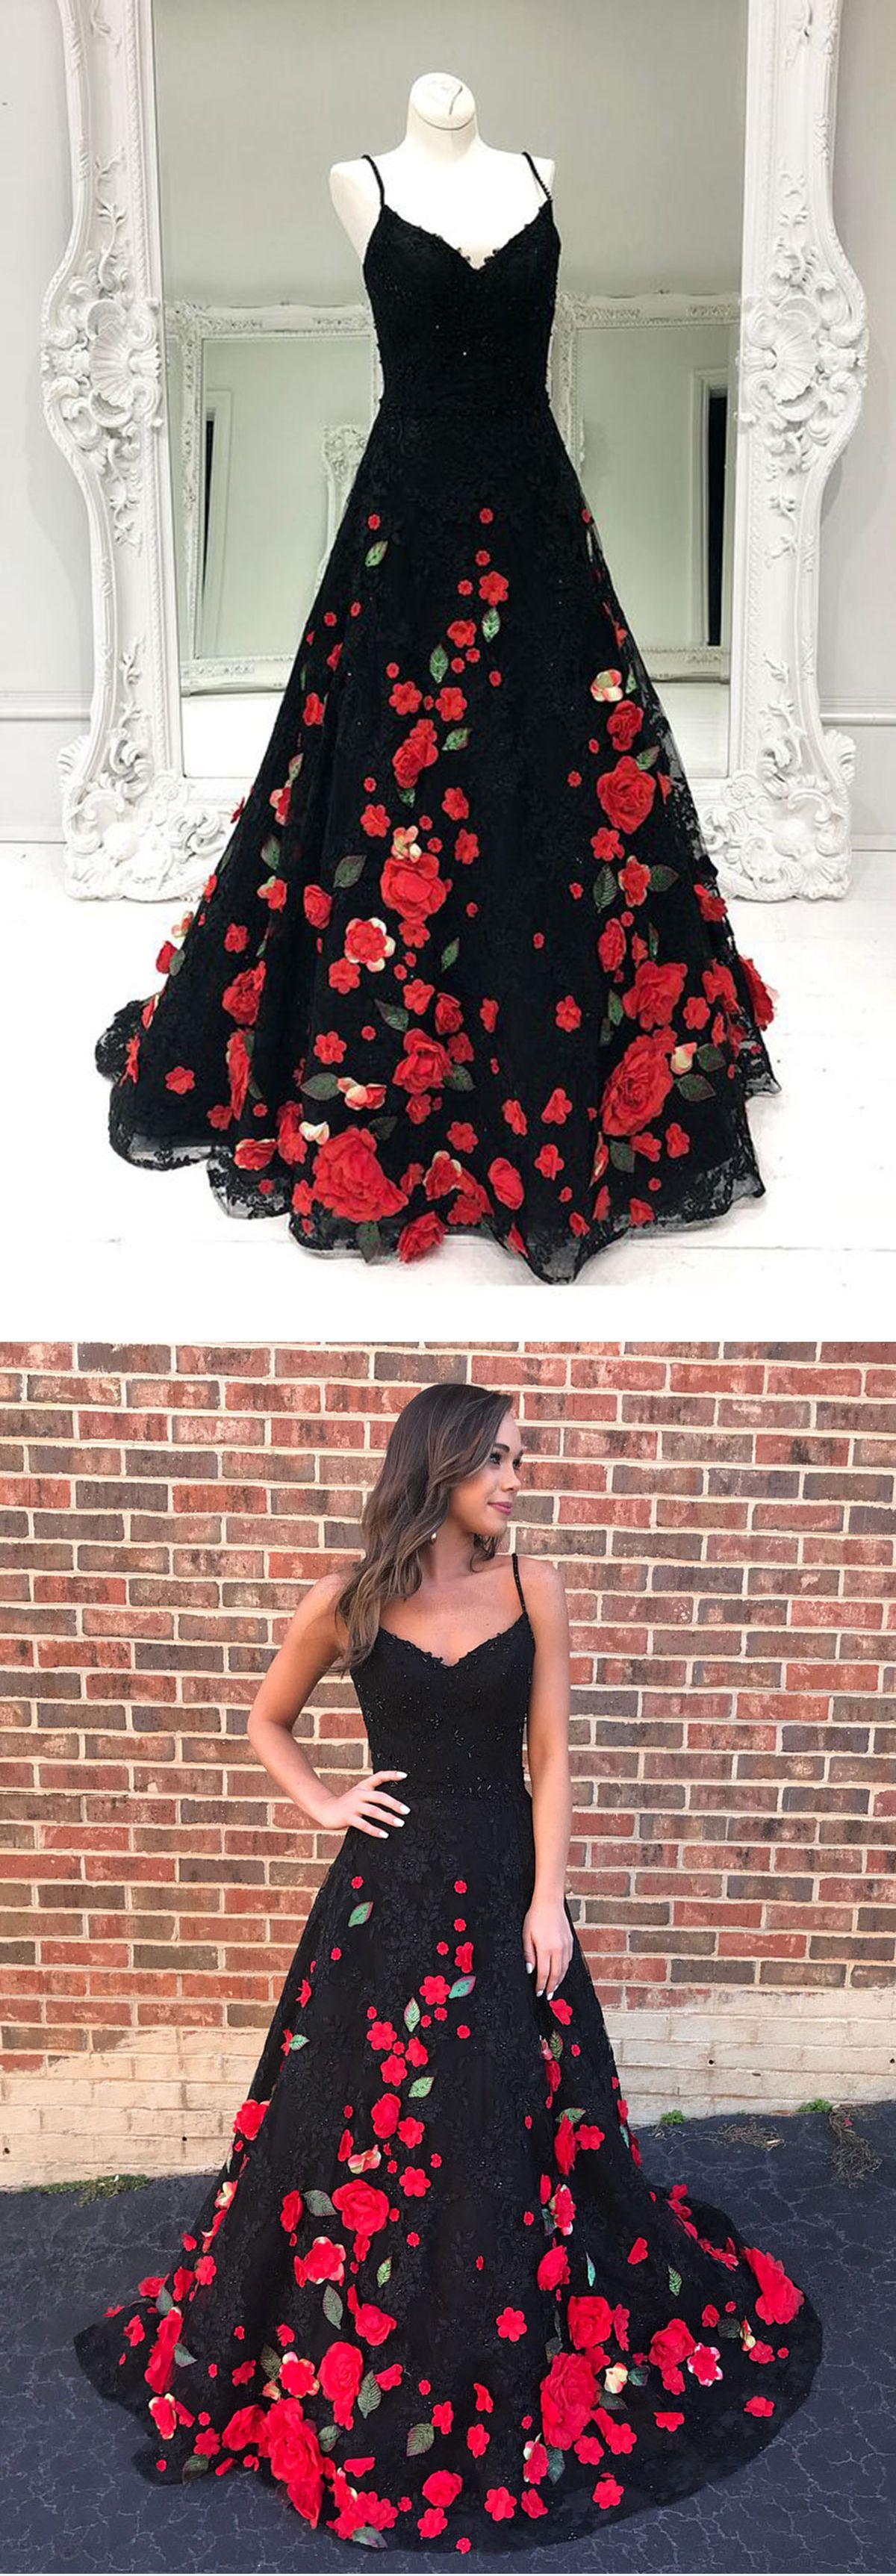 Gorgeous black flower lace long customize prom dress black evening